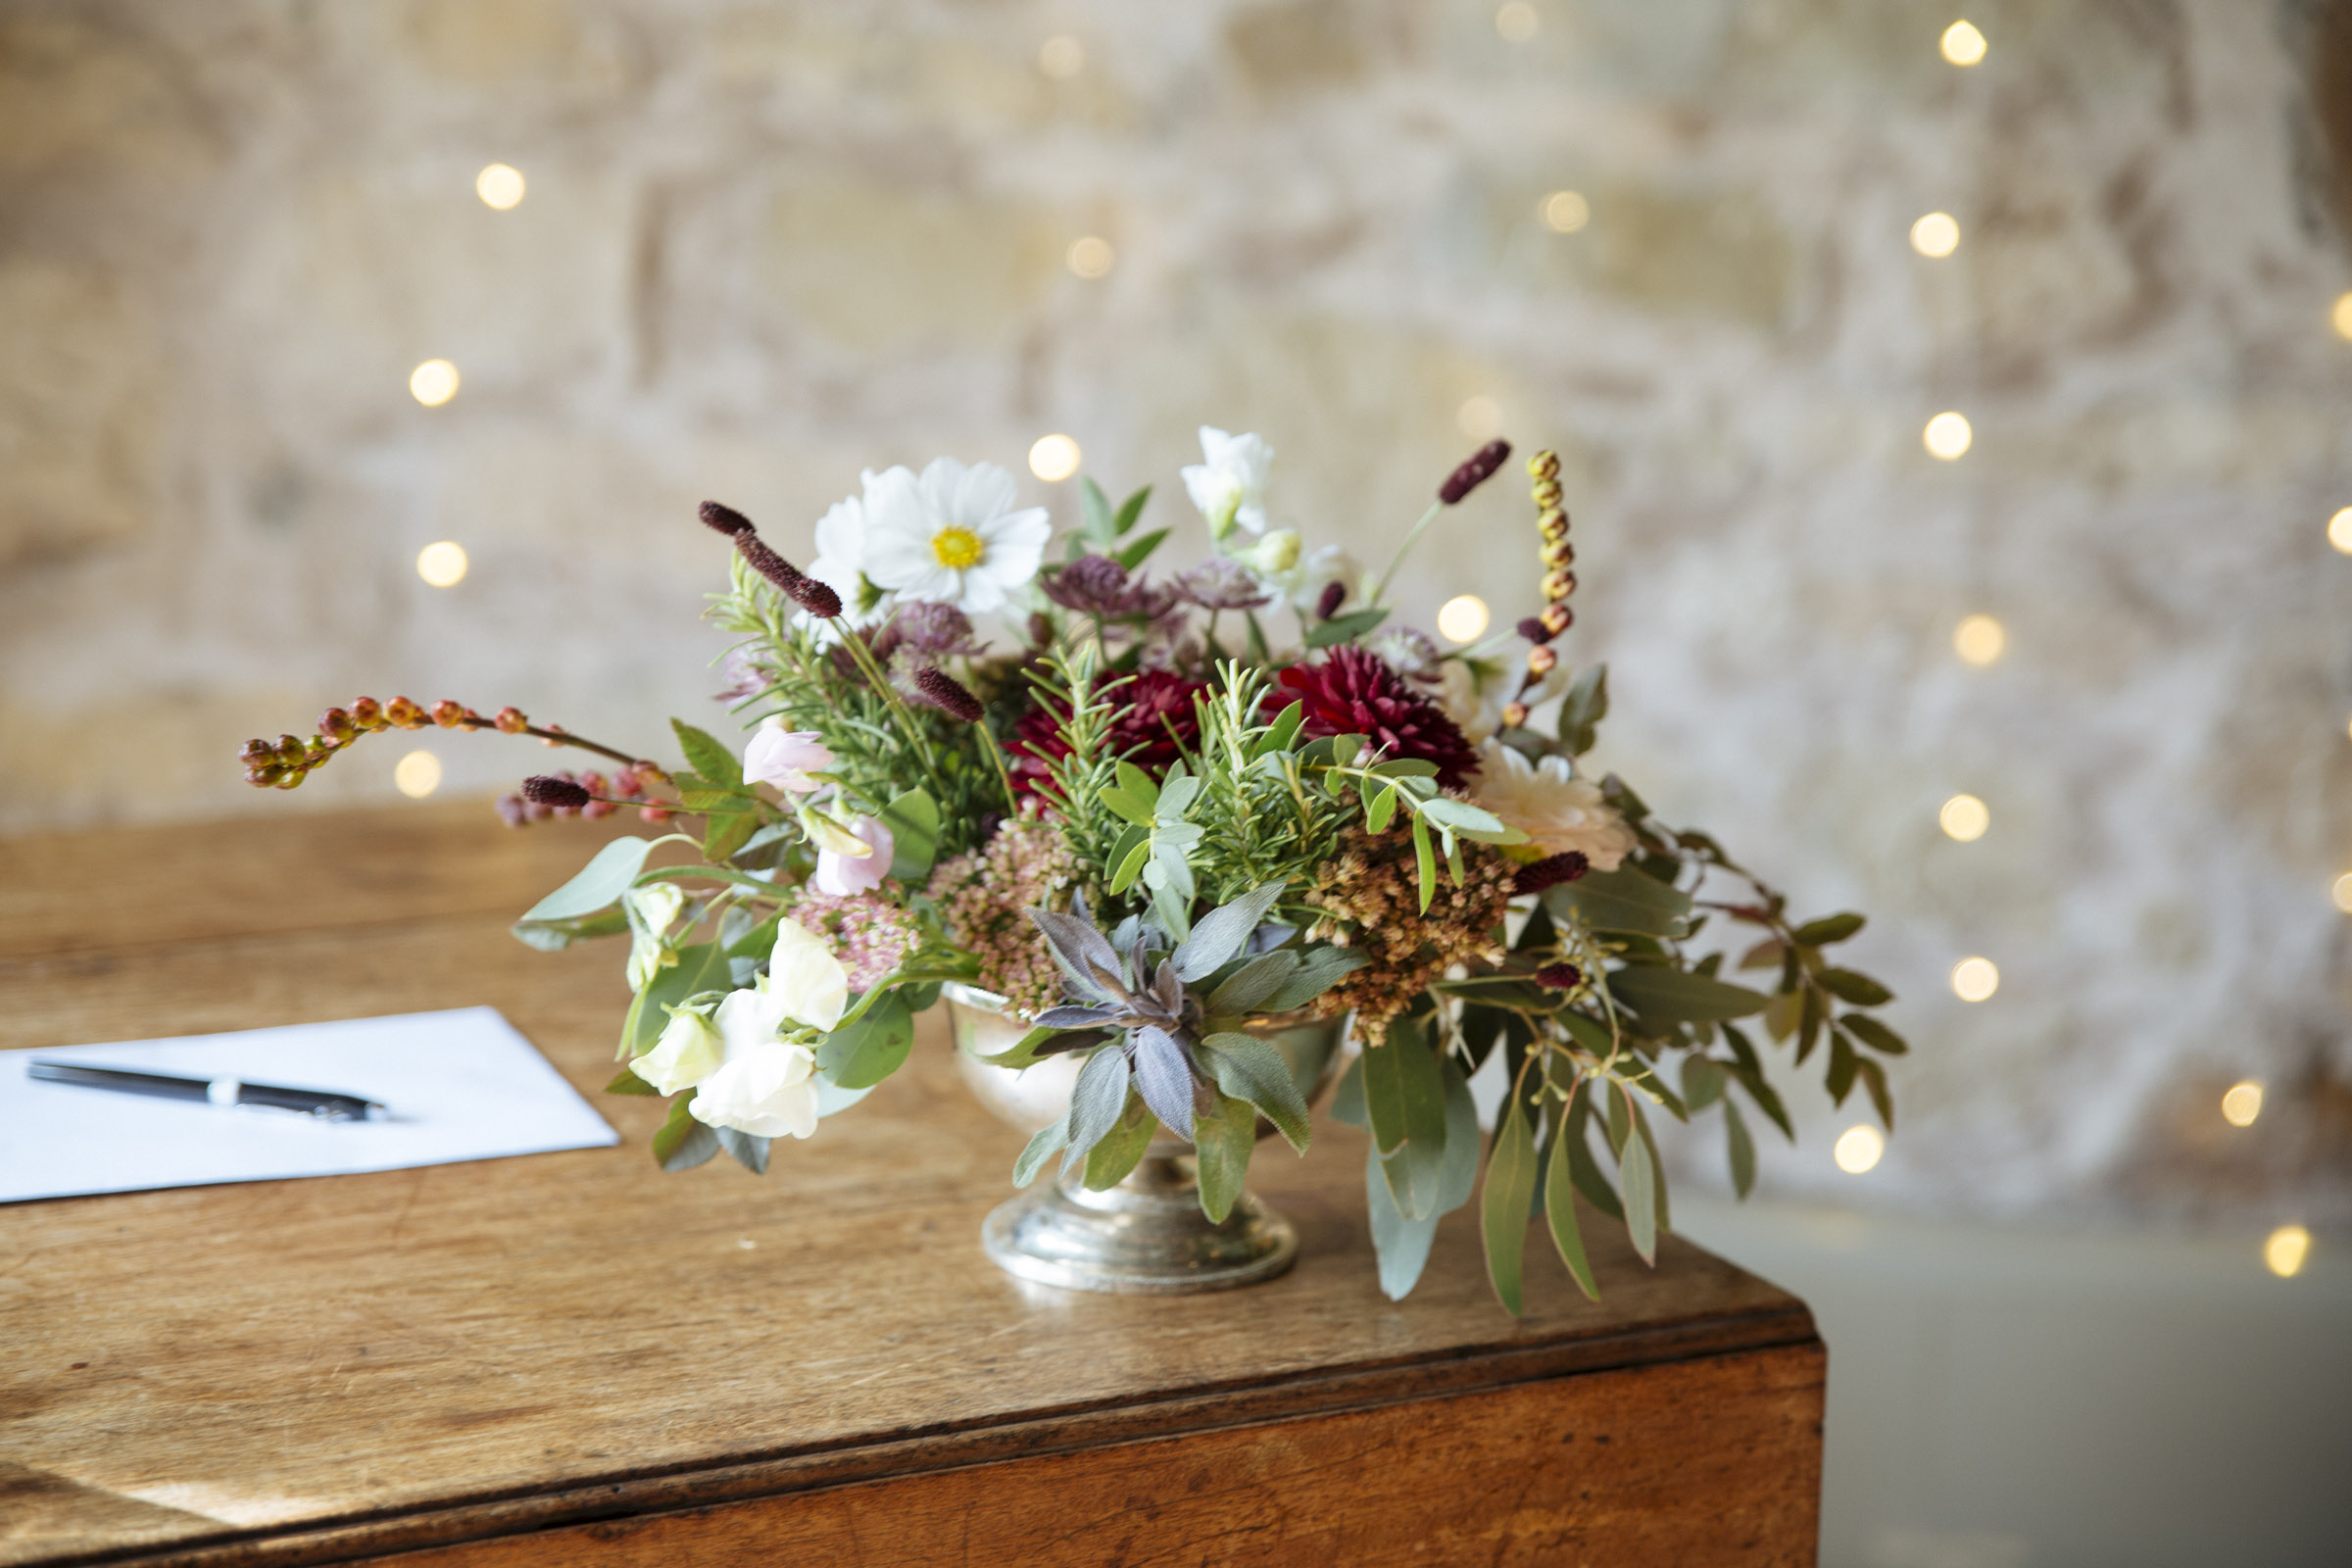 Hedgerow Florist | Scottish Wedding at Kirknewton Stables by Ceranna Edinburgh Wedding Photographer